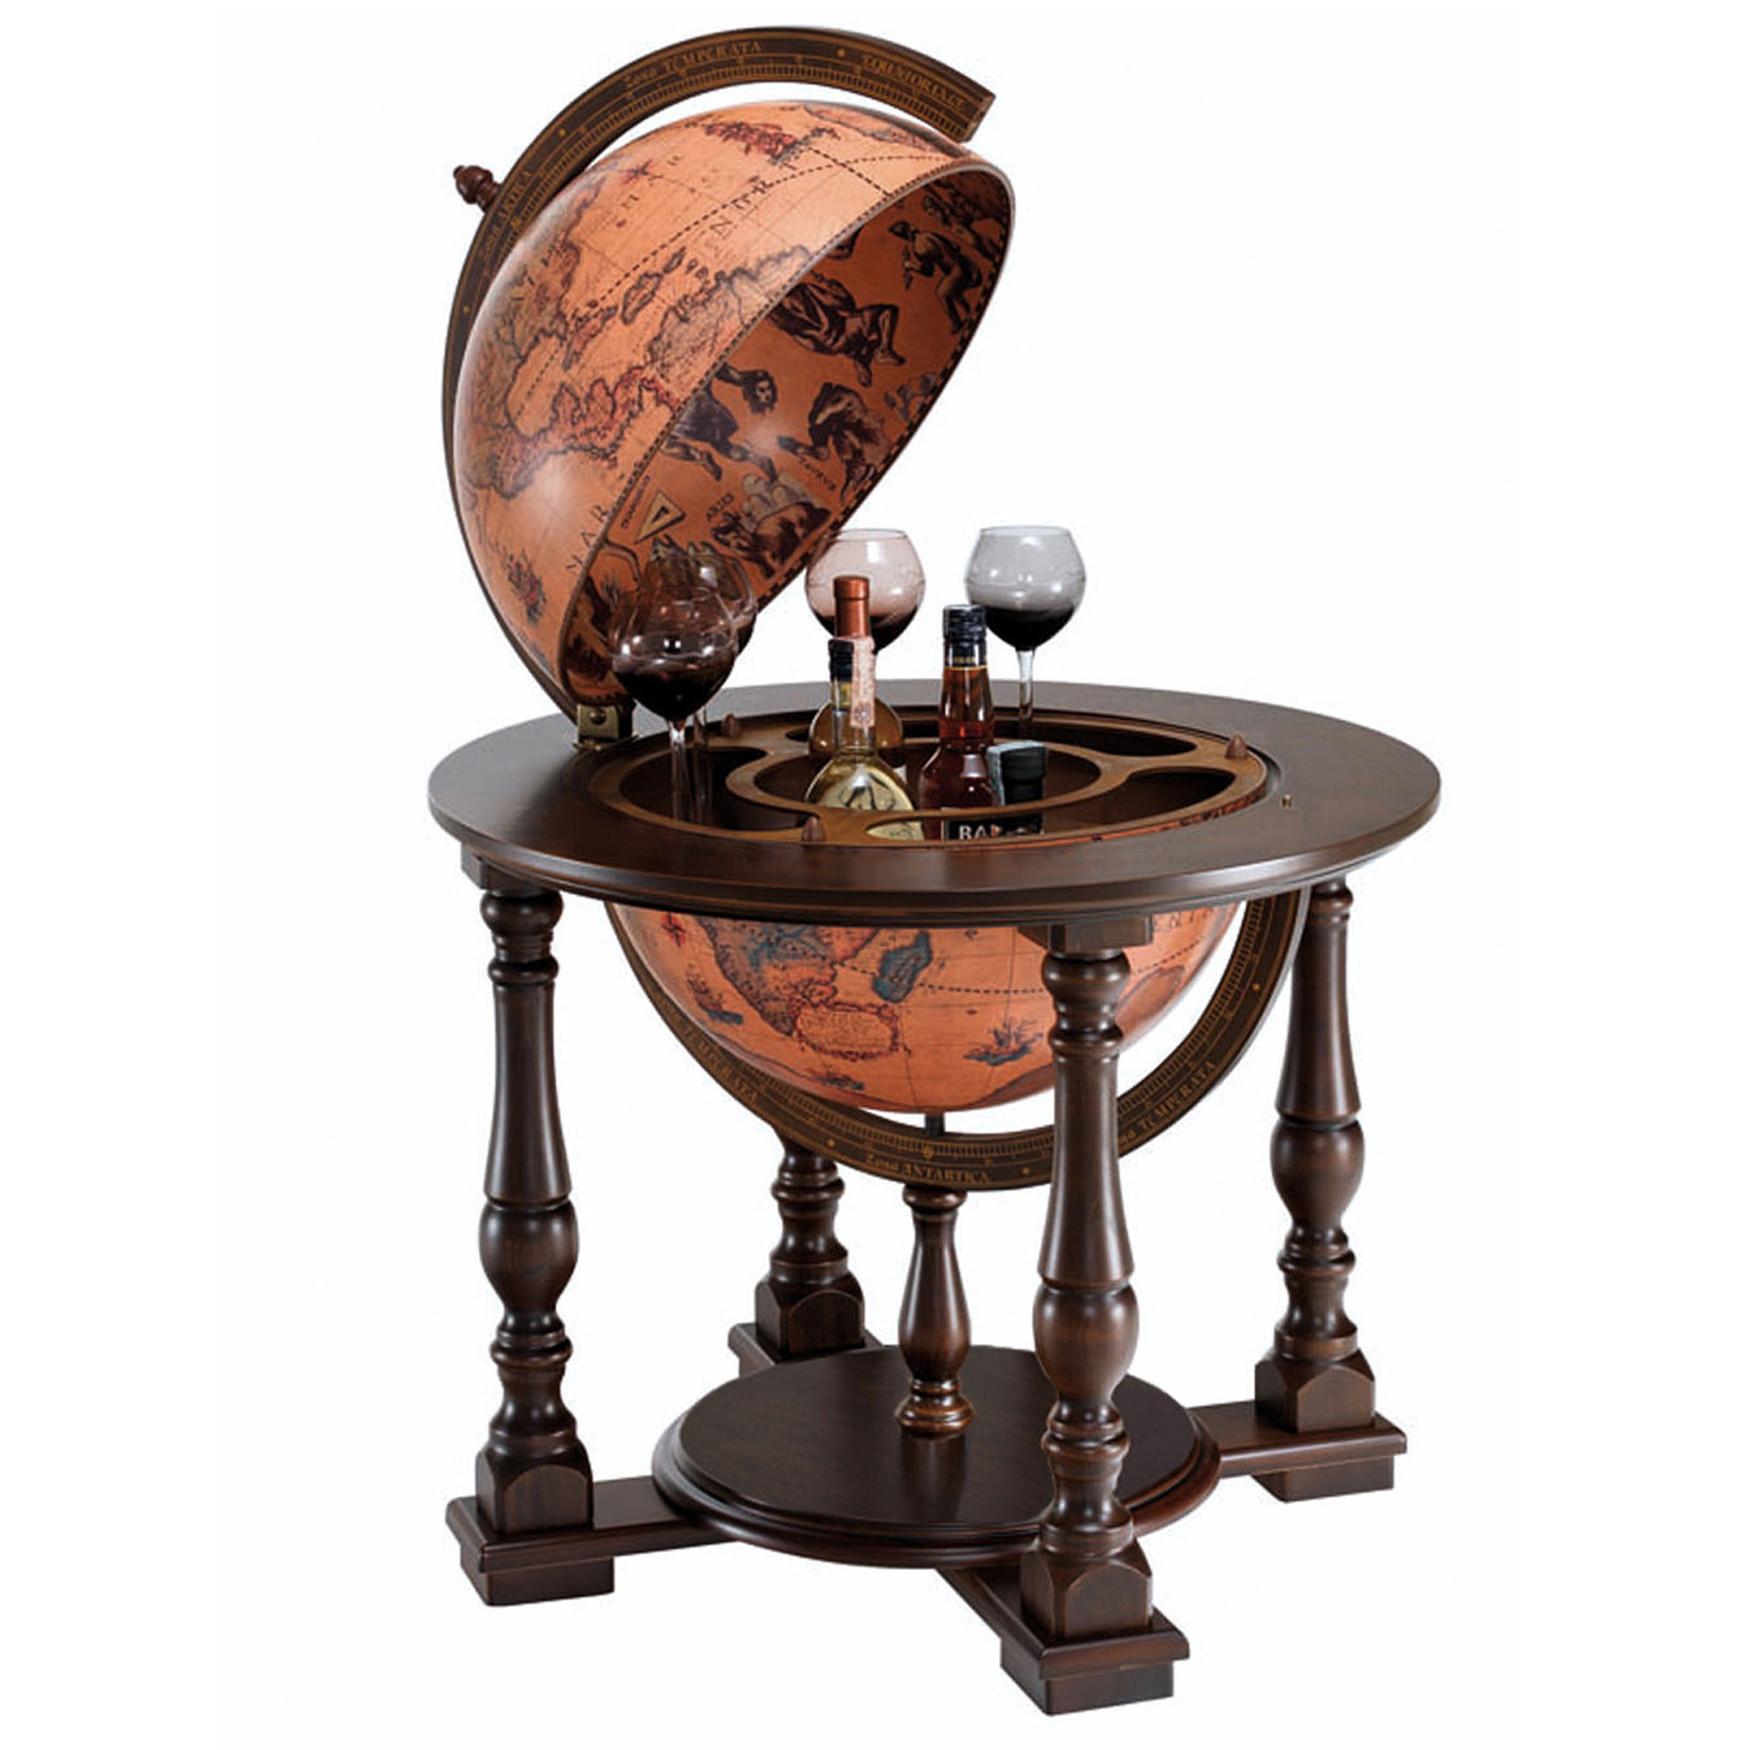 Cortes Globe Bar Made in Italy